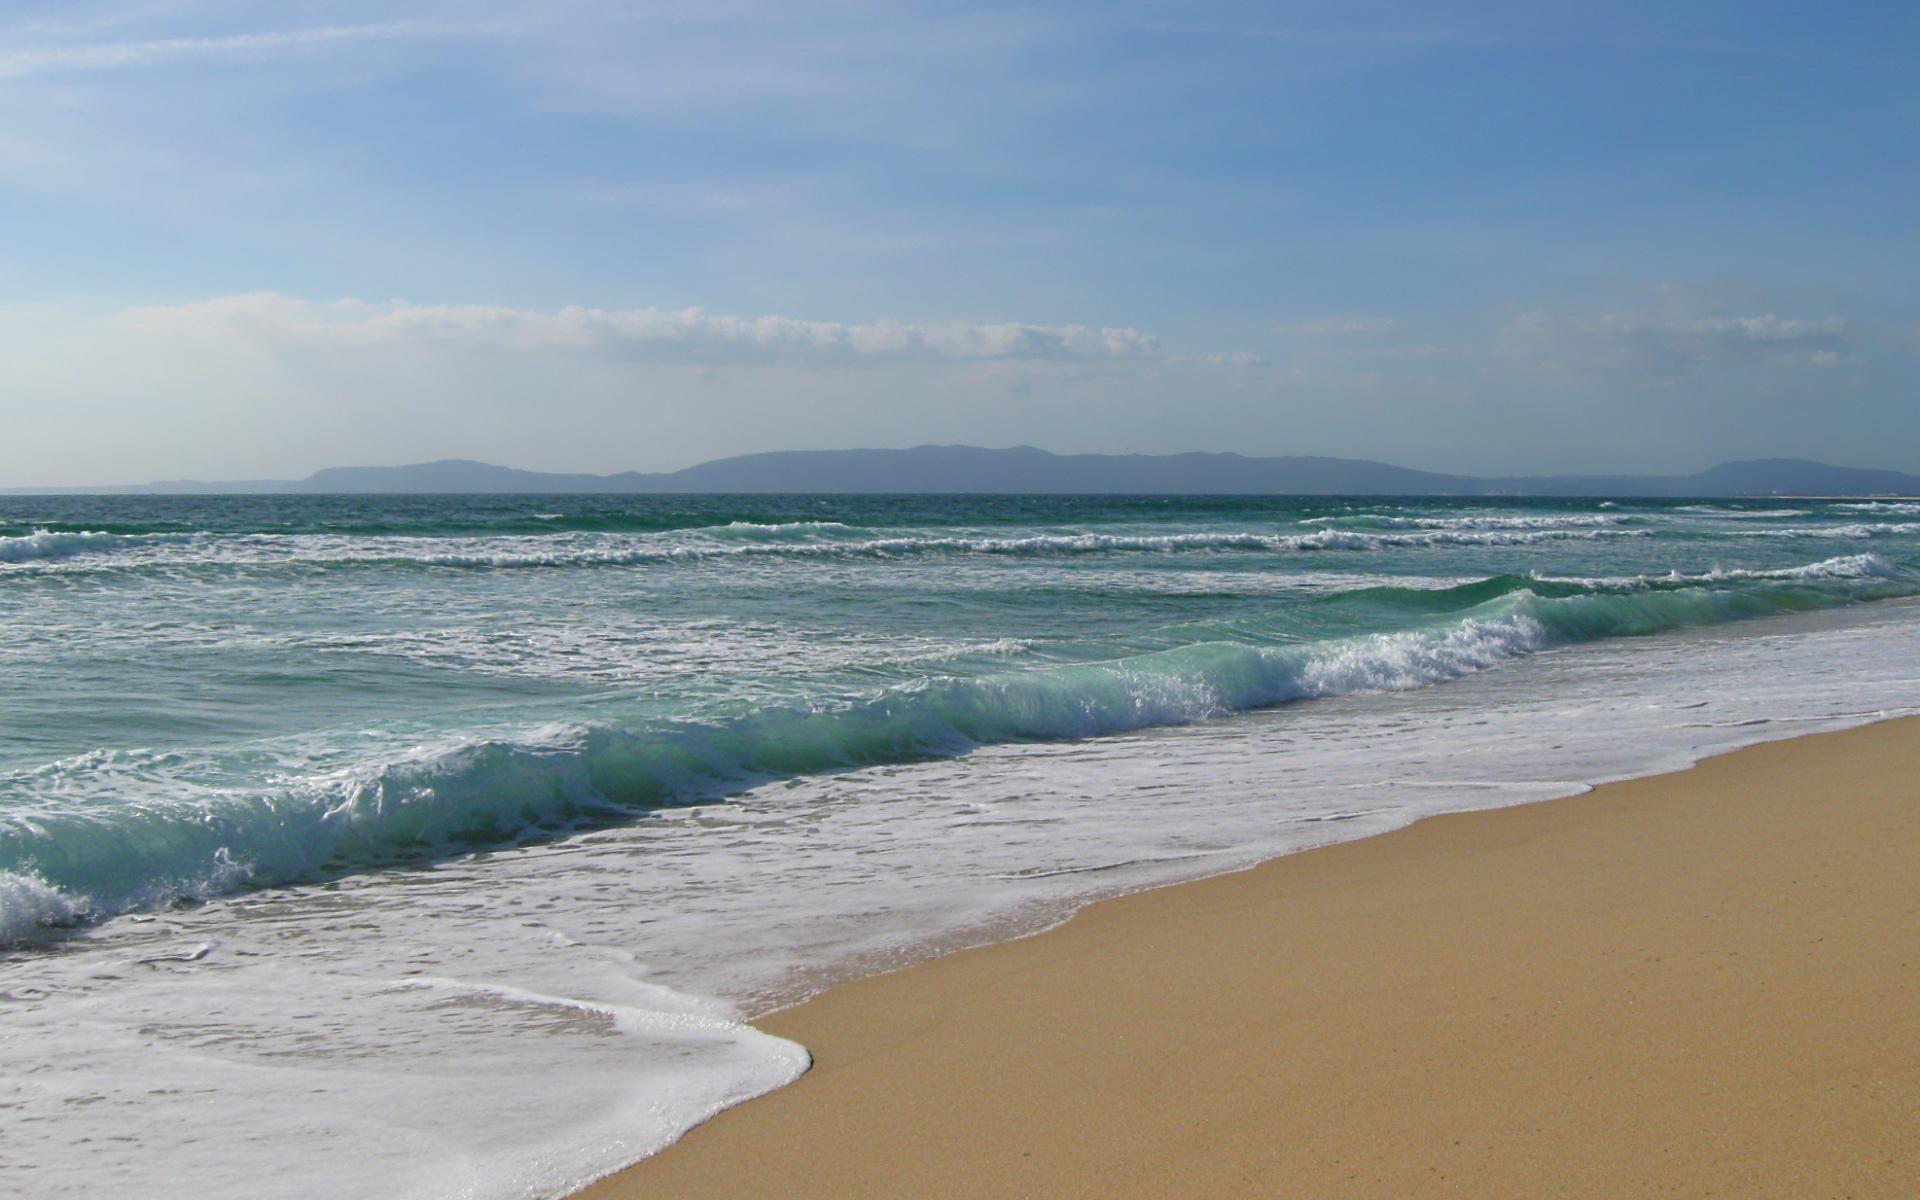 На запорожском курорте на пляже обнаружили тело молодого парня